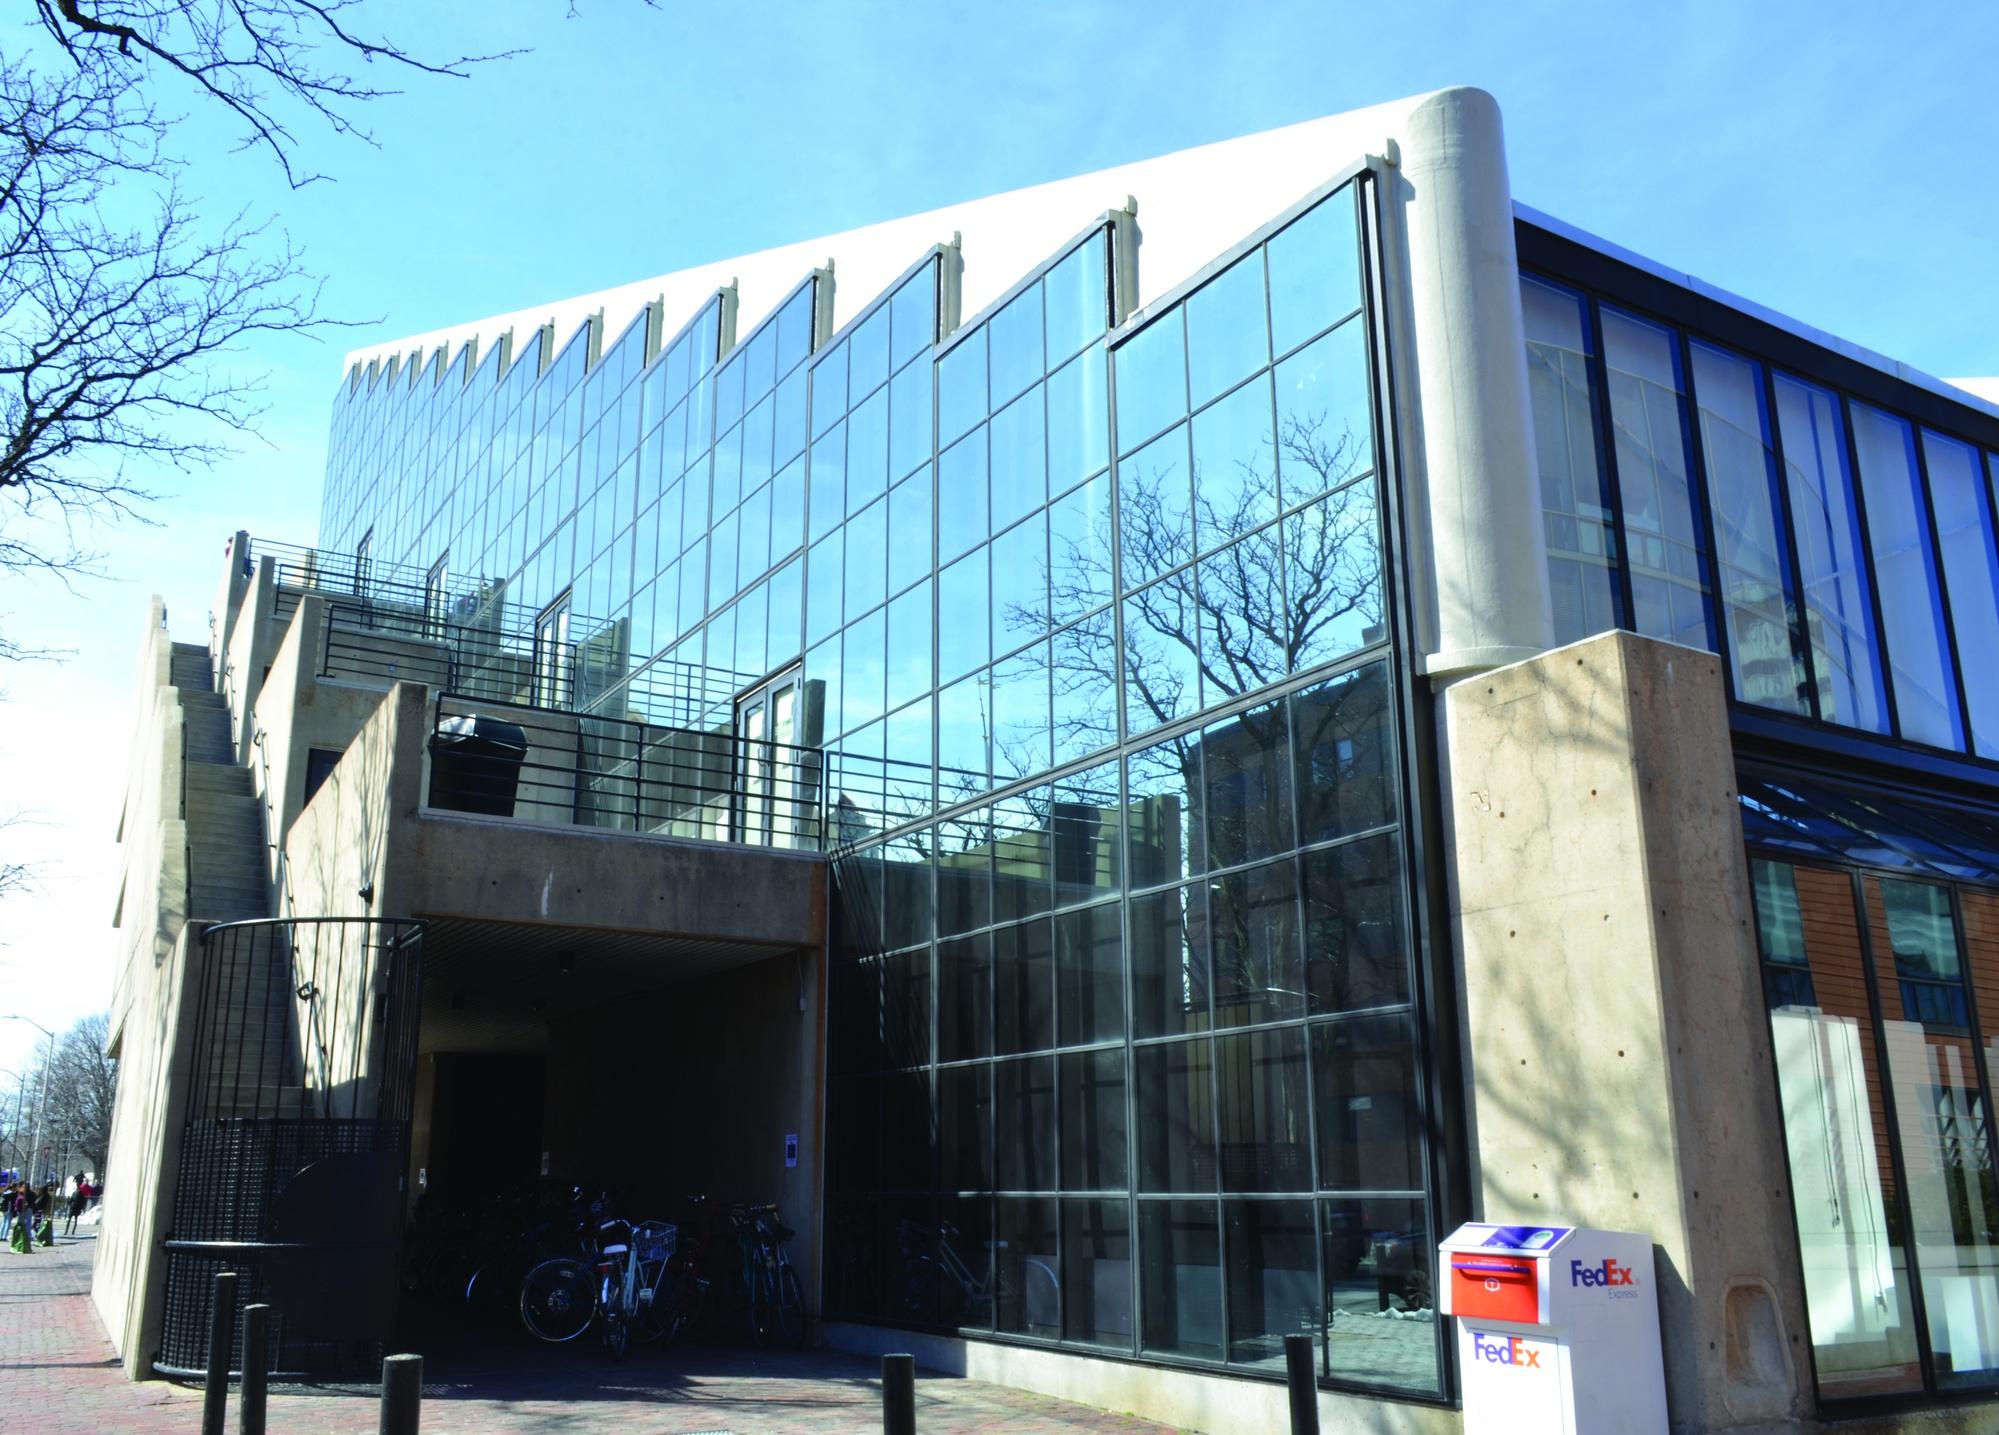 Harvard's Graduate School of Design